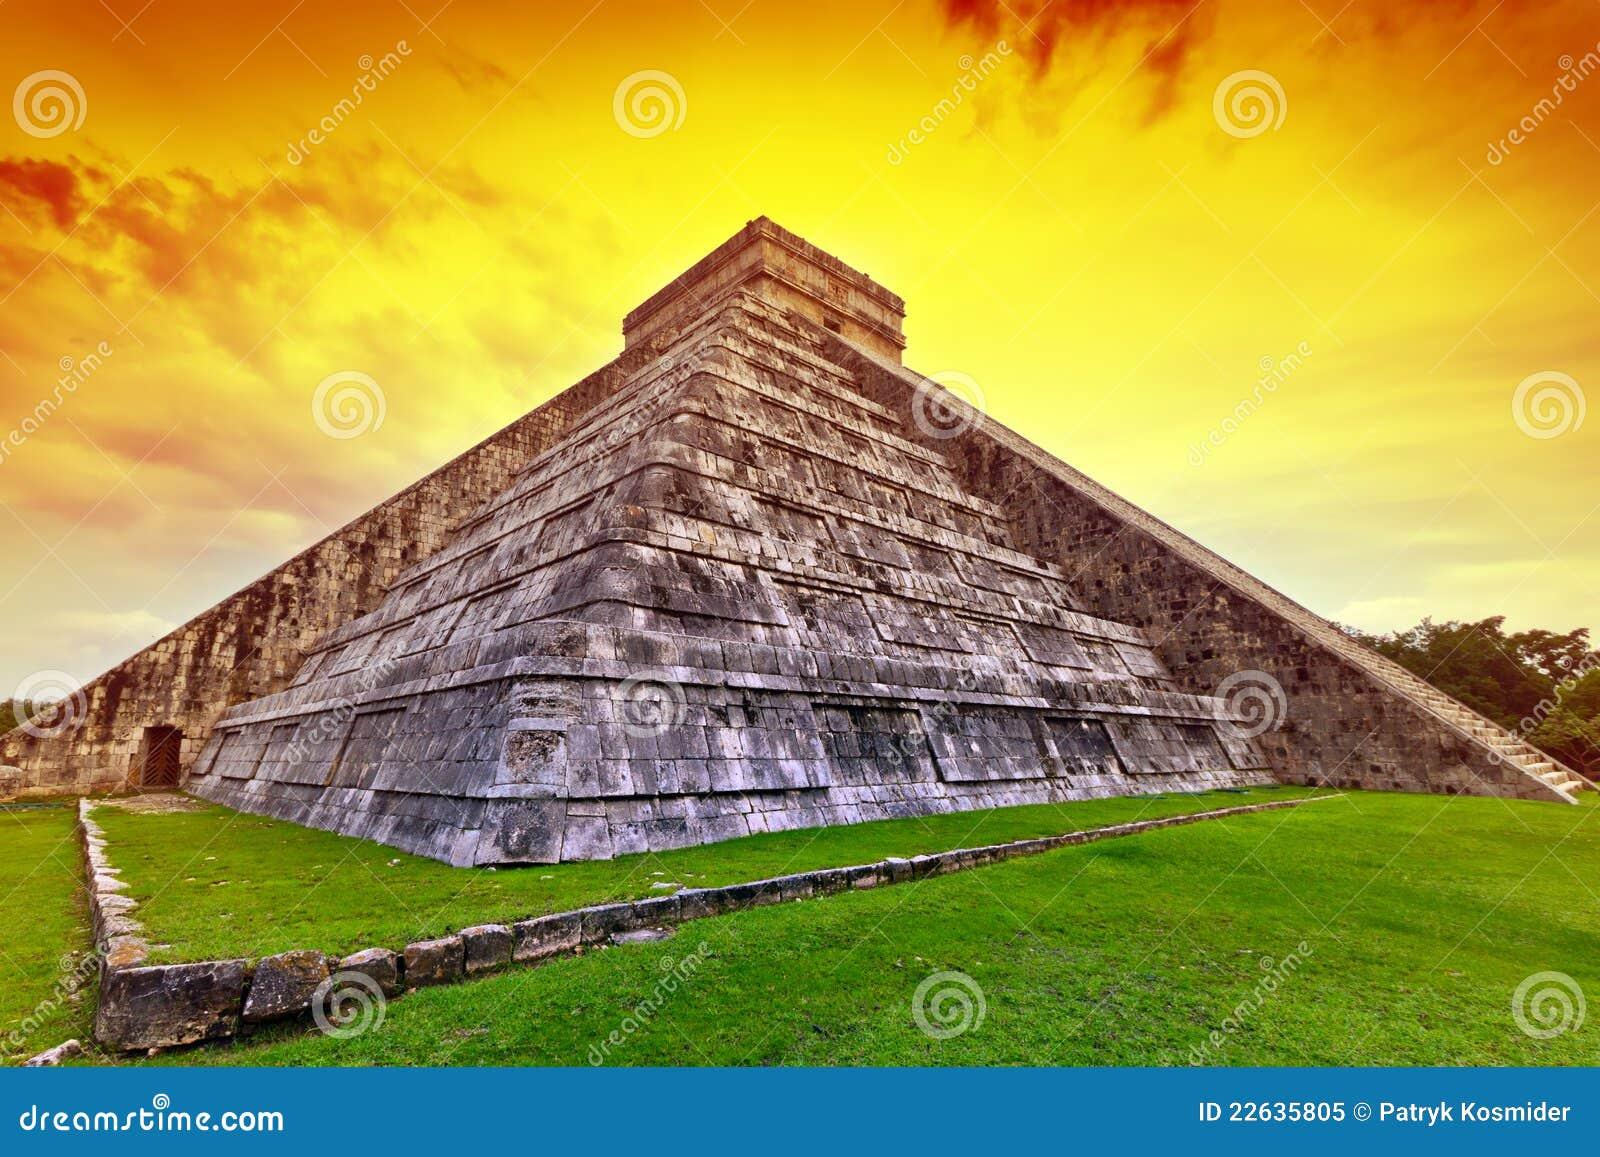 kukulkan pyramid in chichen itza at sunset royalty free farmer wife clipart Cartoon Farmer and Wife